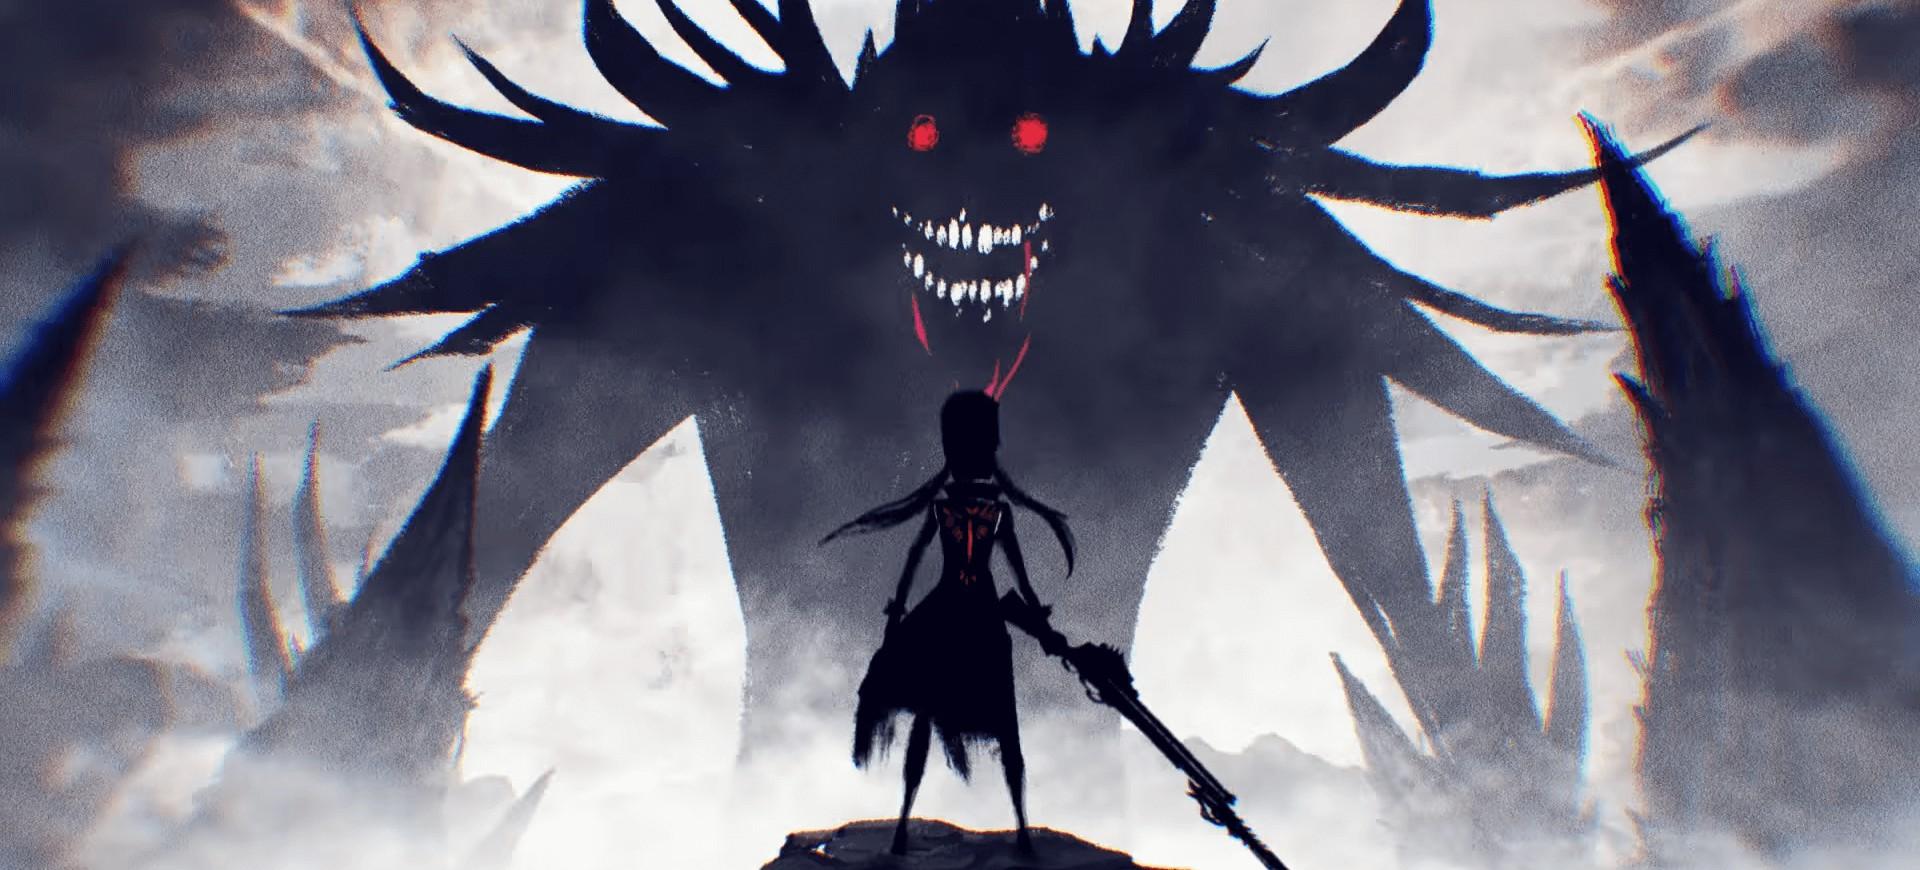 GameStart 2017: Code Vein - Tái sinh - Giới Thiệu Game